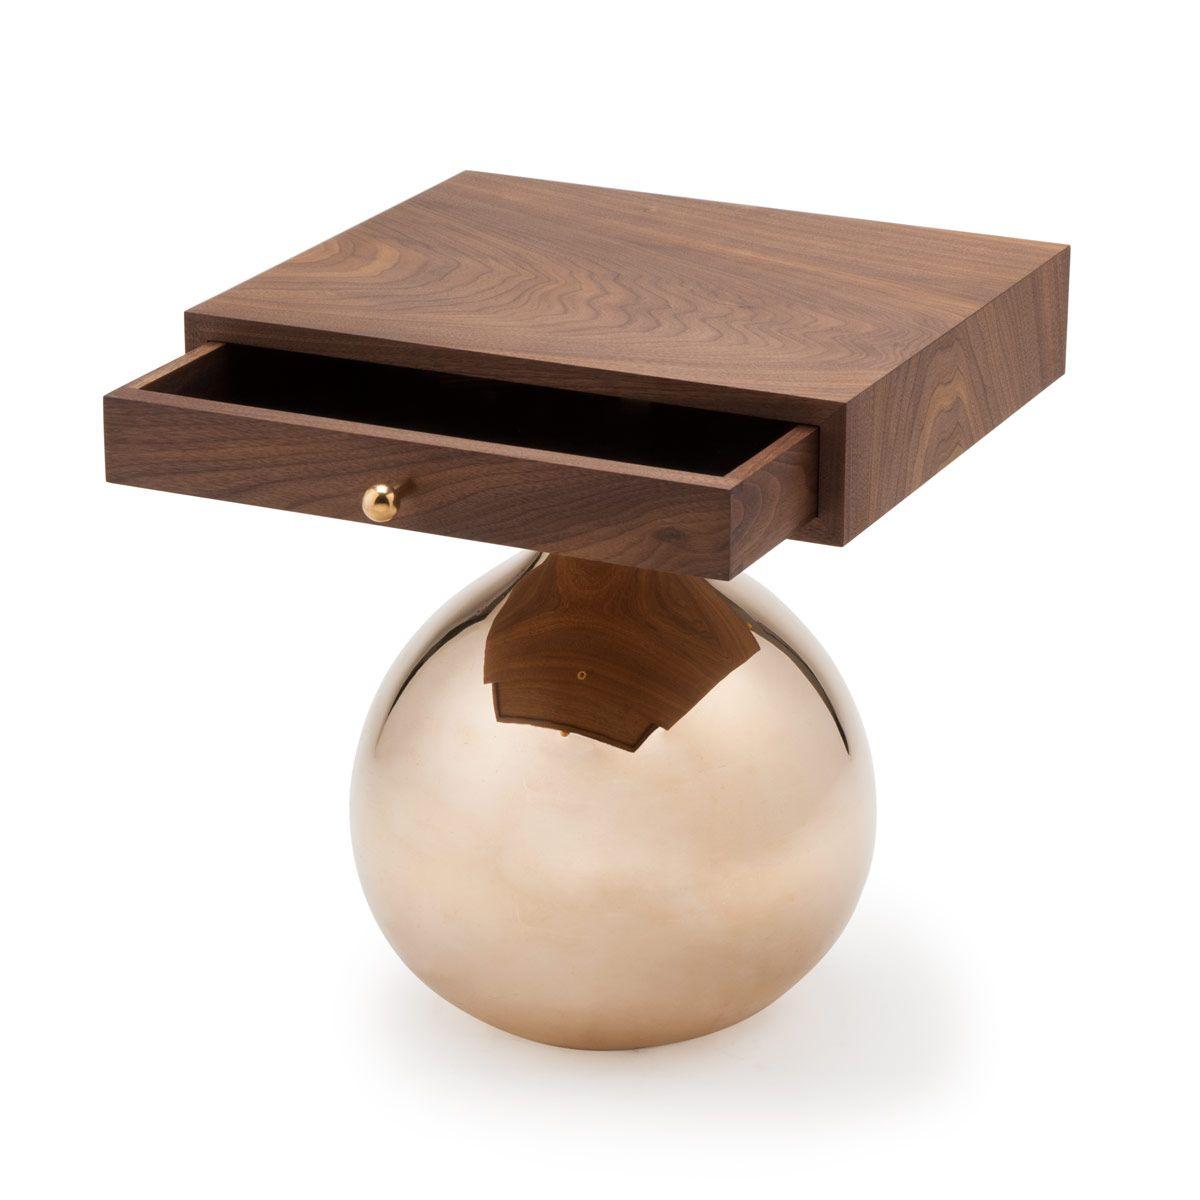 Bauble side table amy somerville 분위기포인트컬러 pinterest